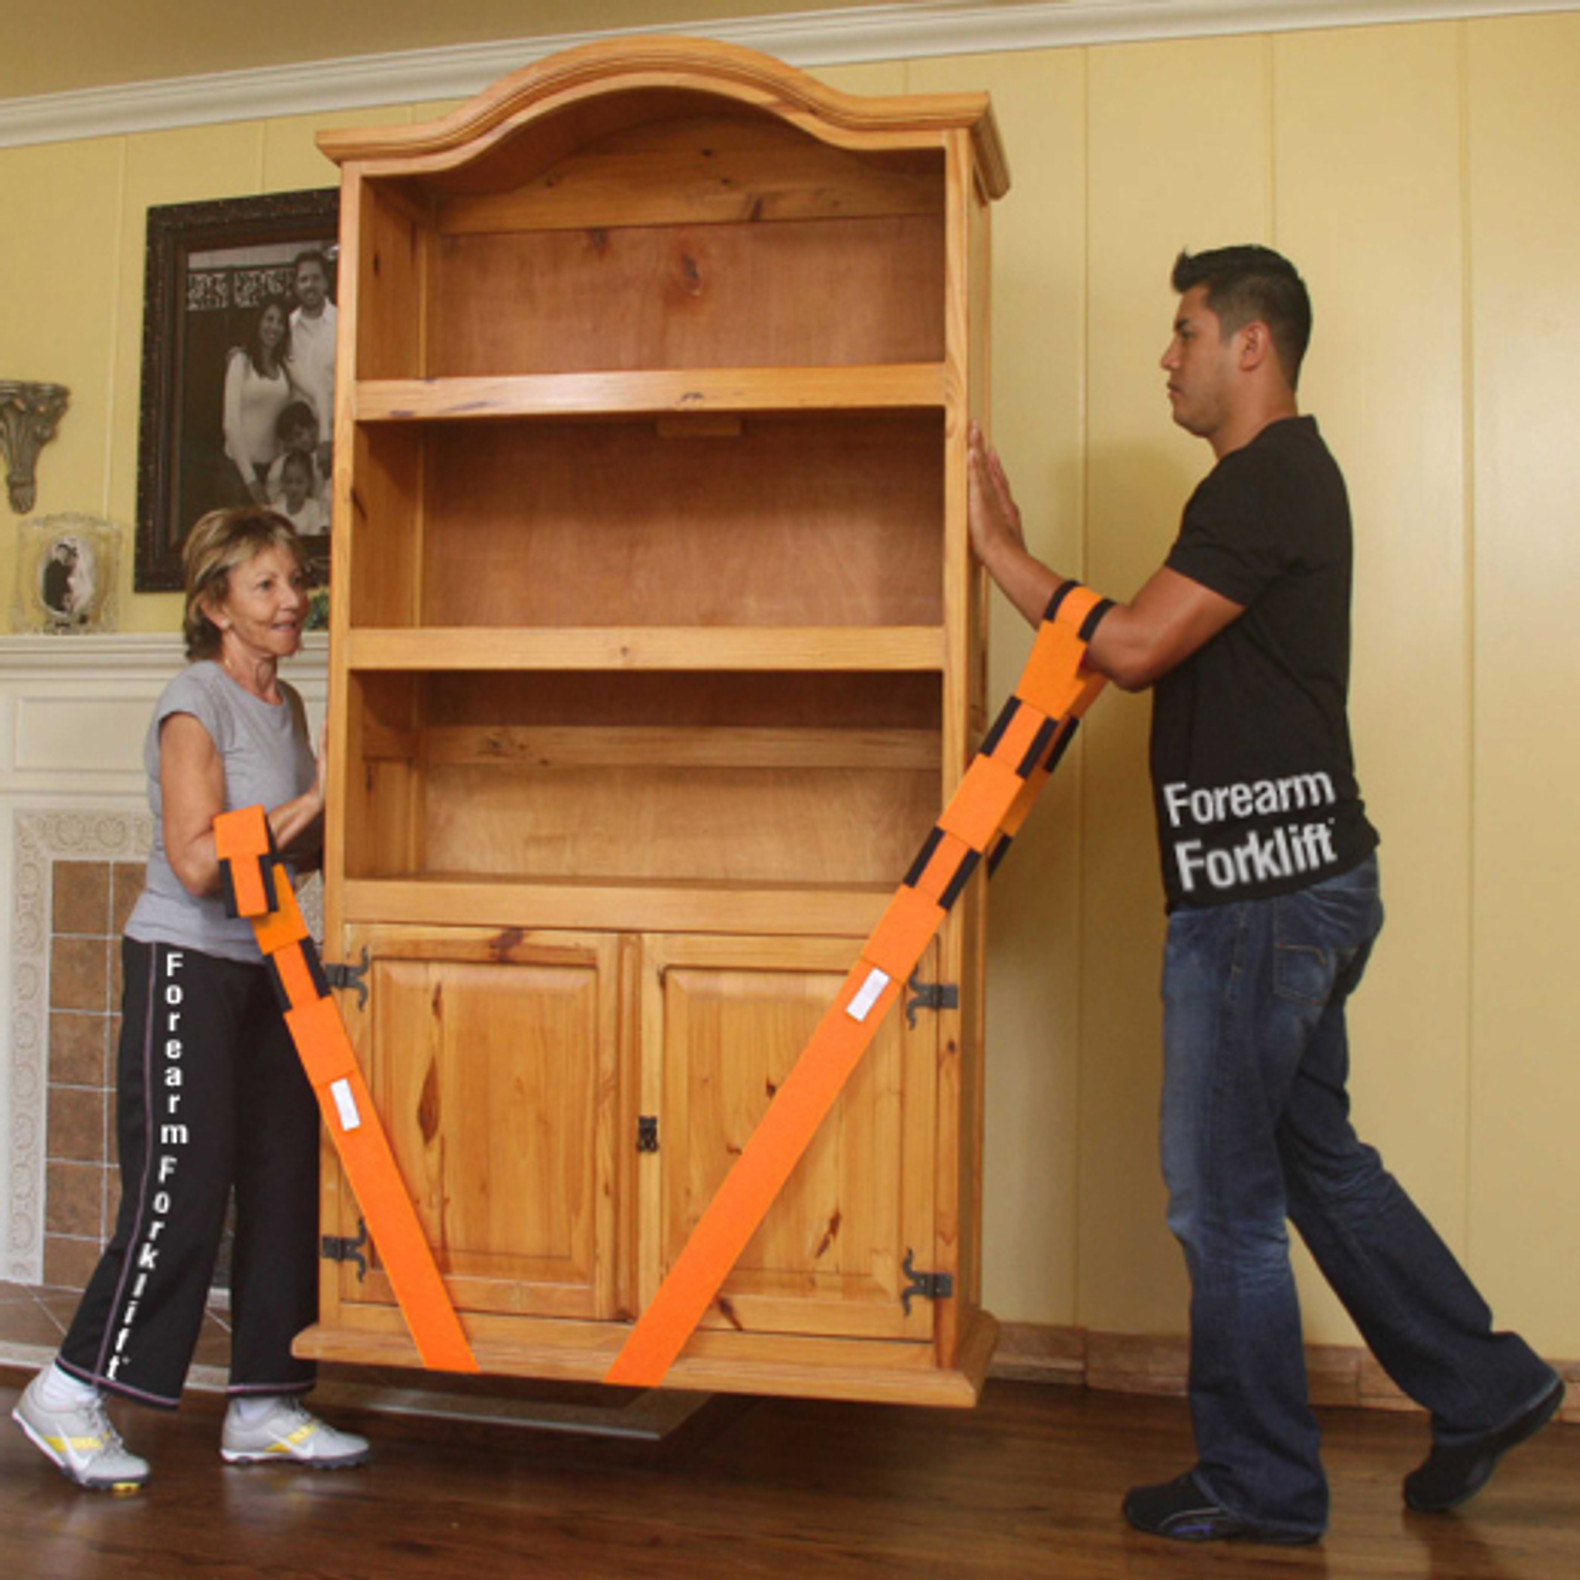 Forearm Foklift Lifting Straps Orange